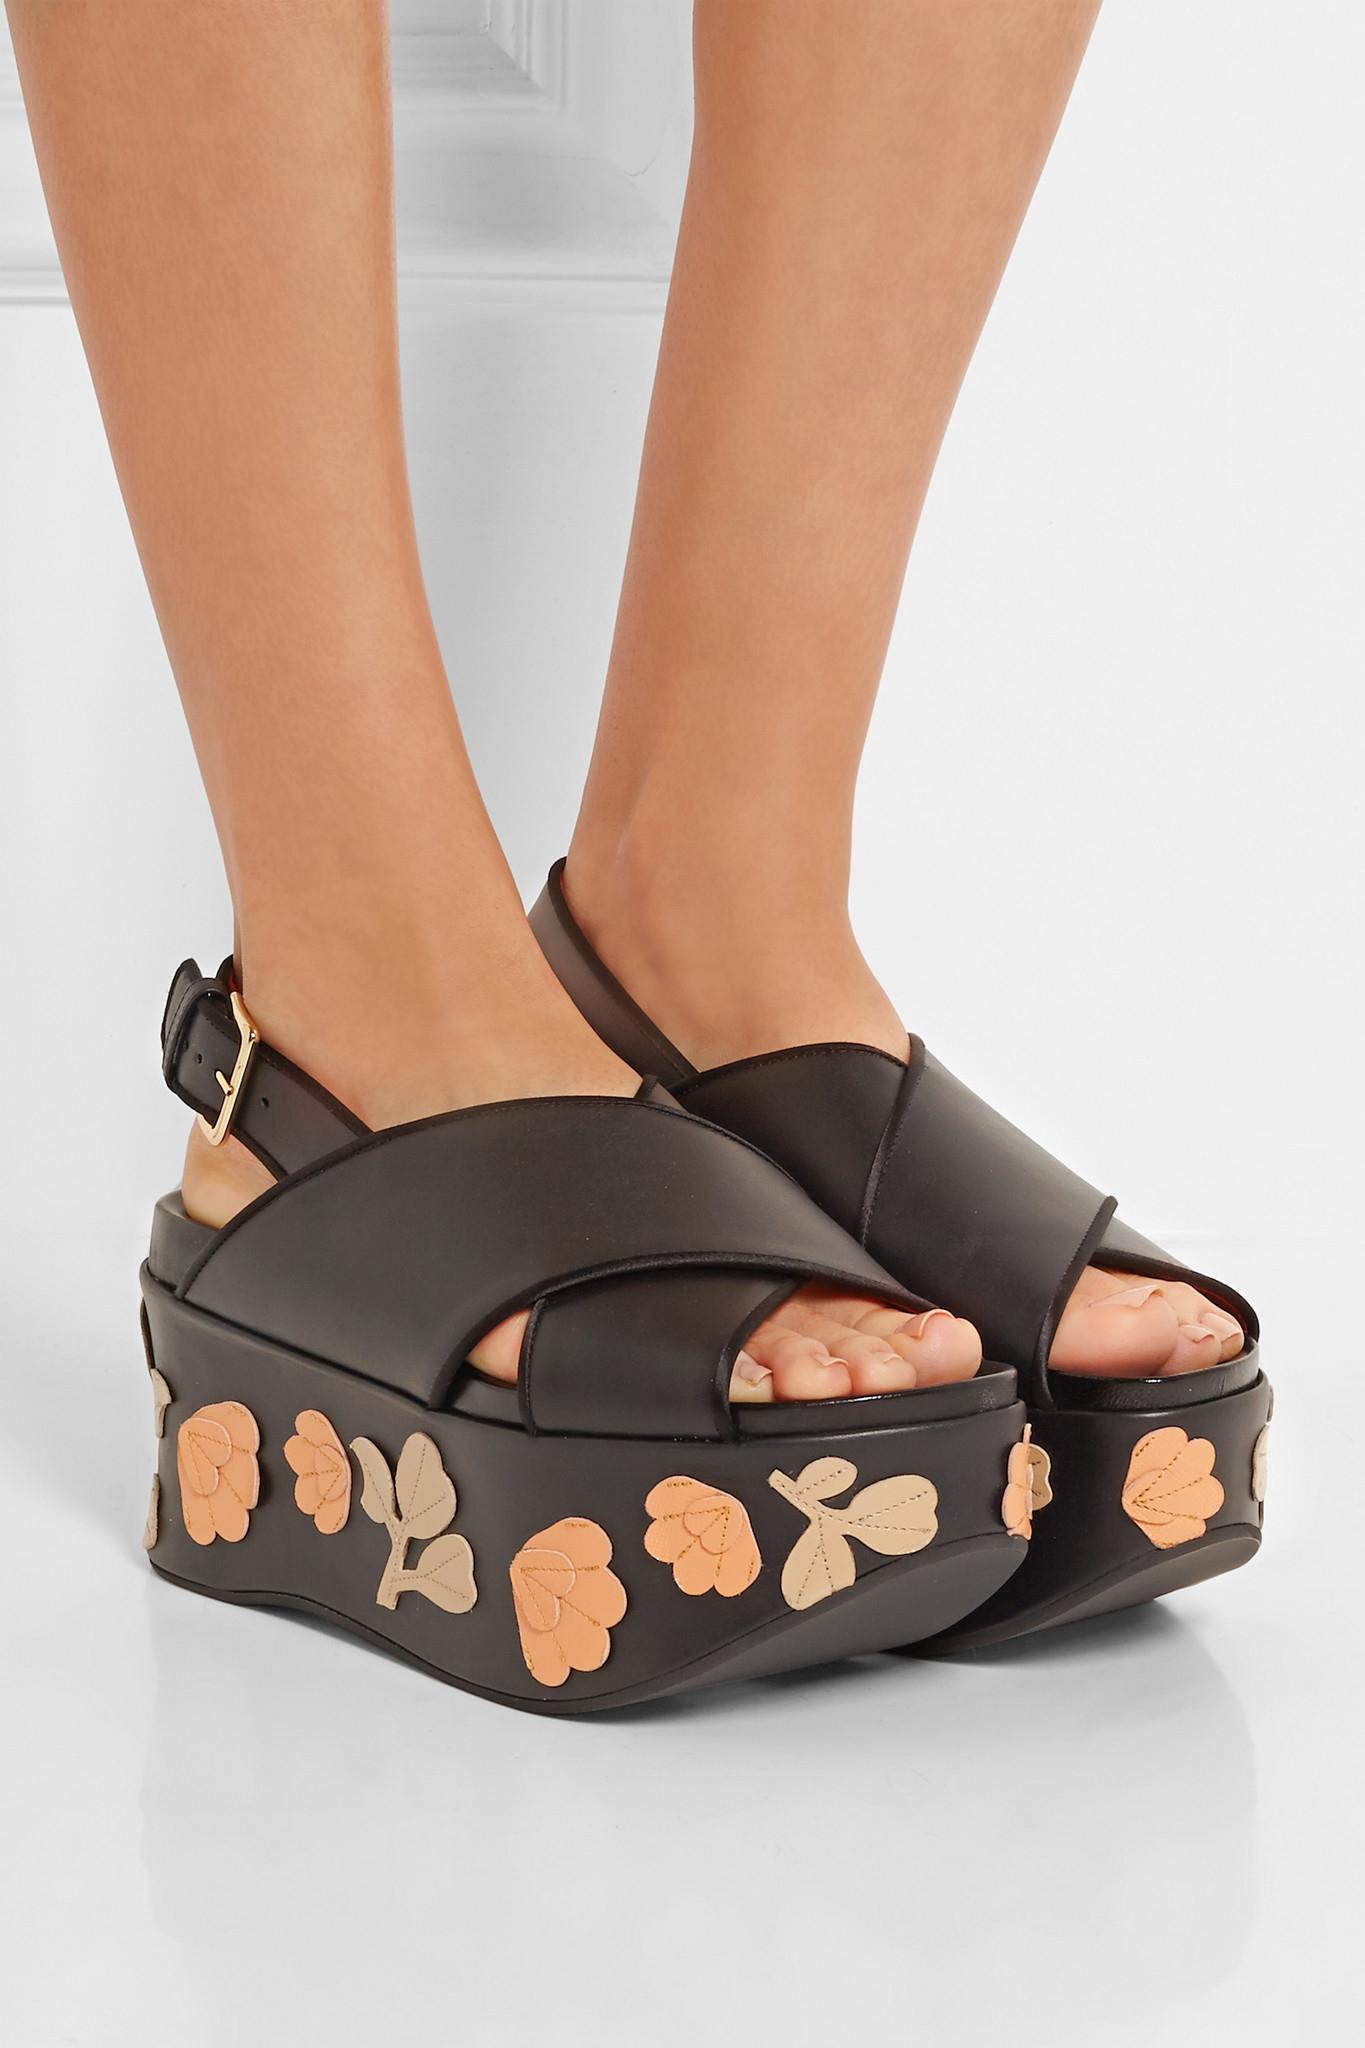 Marni Appliquéd Leather Sandals Outlet 5fPfuqhk7